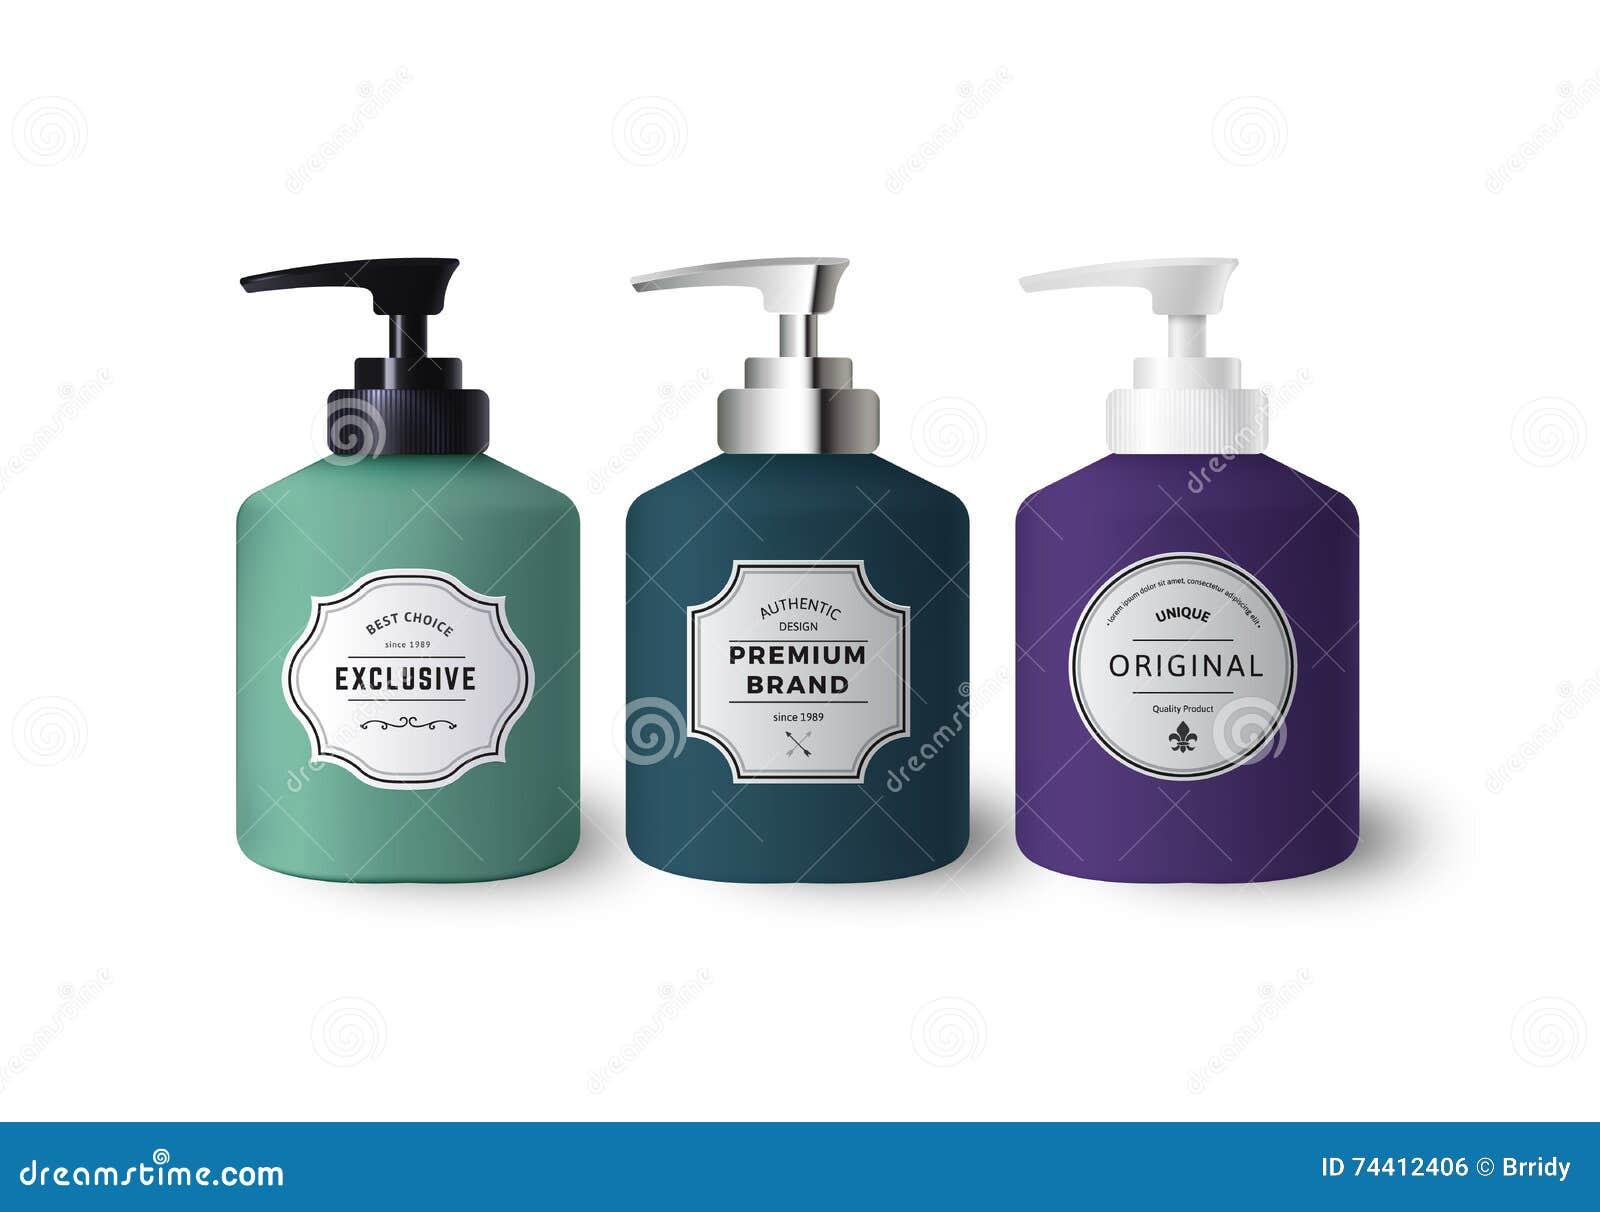 Distribuidores coloridos realísticos do sabão líquido